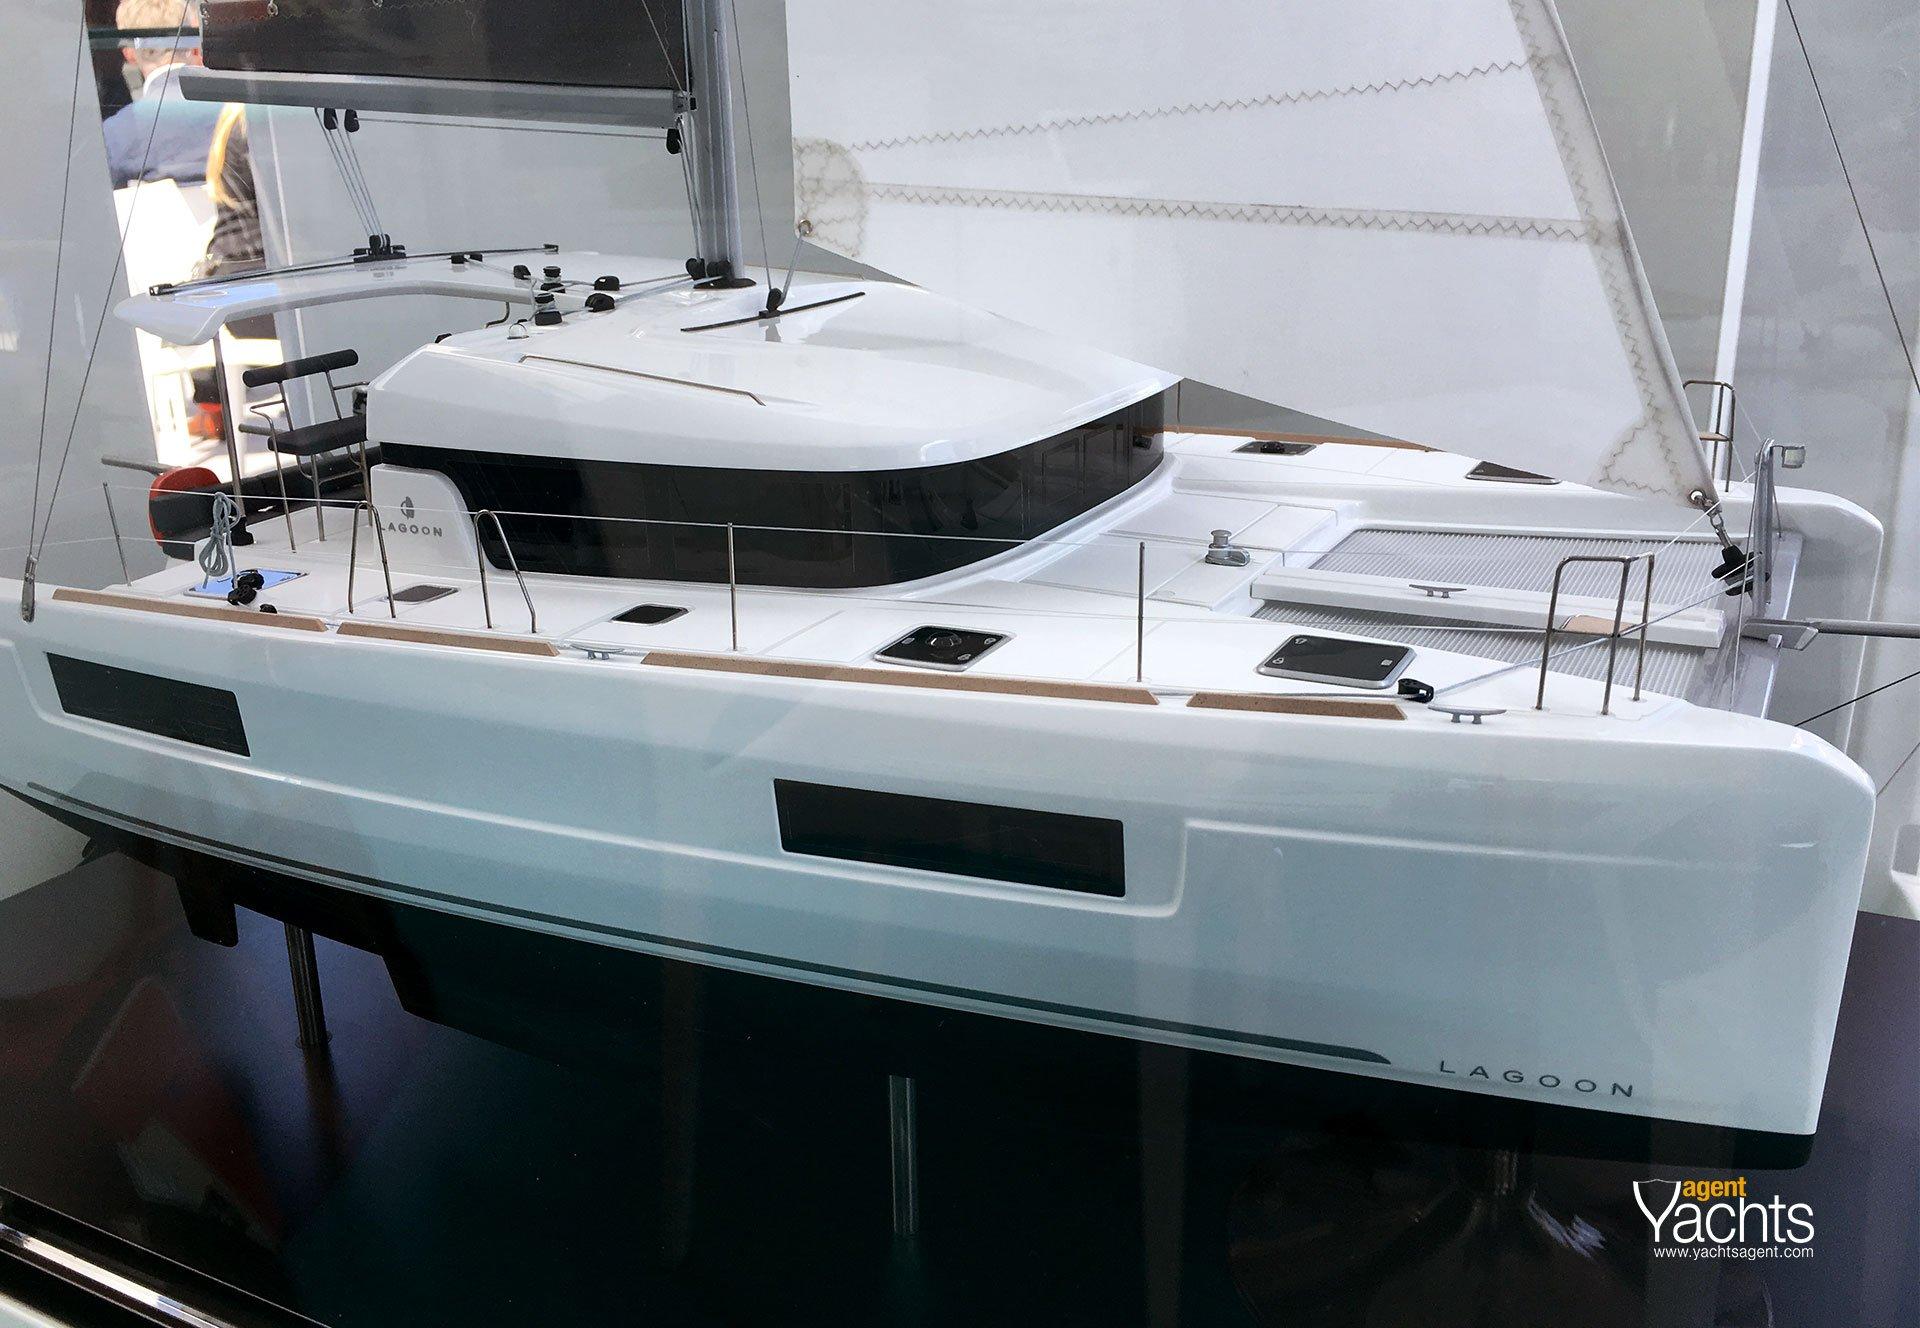 Lagoon 40 model